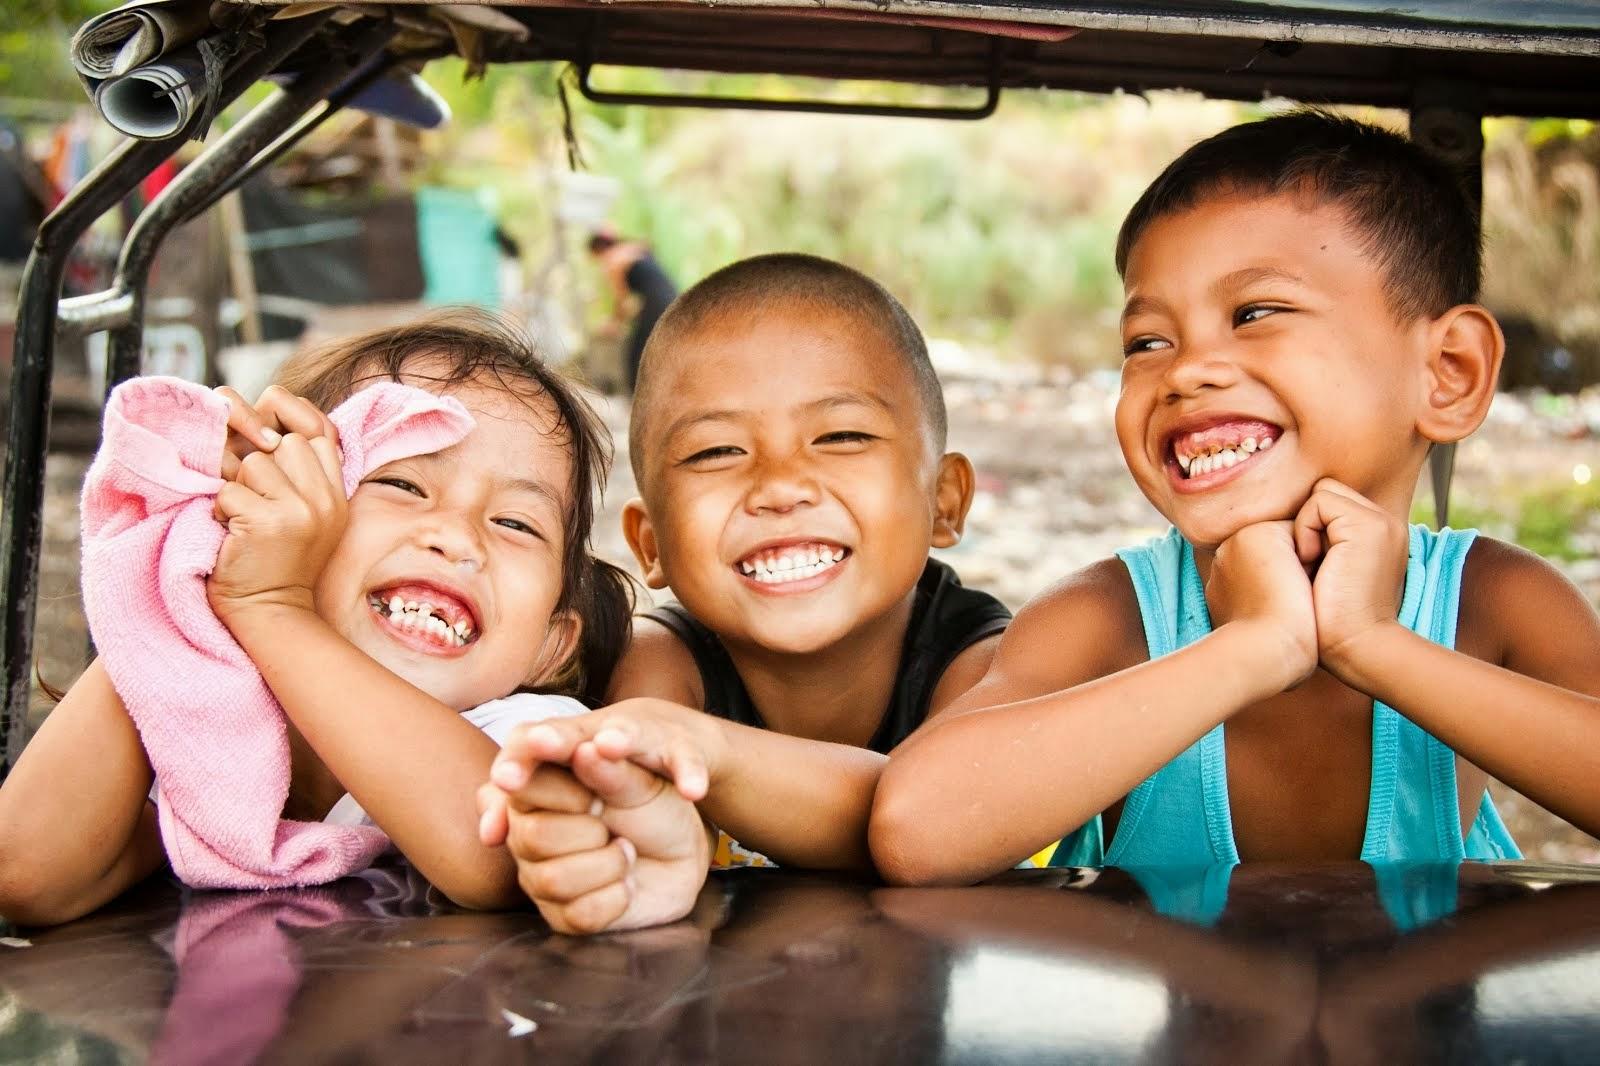 filipino kids - photo #16